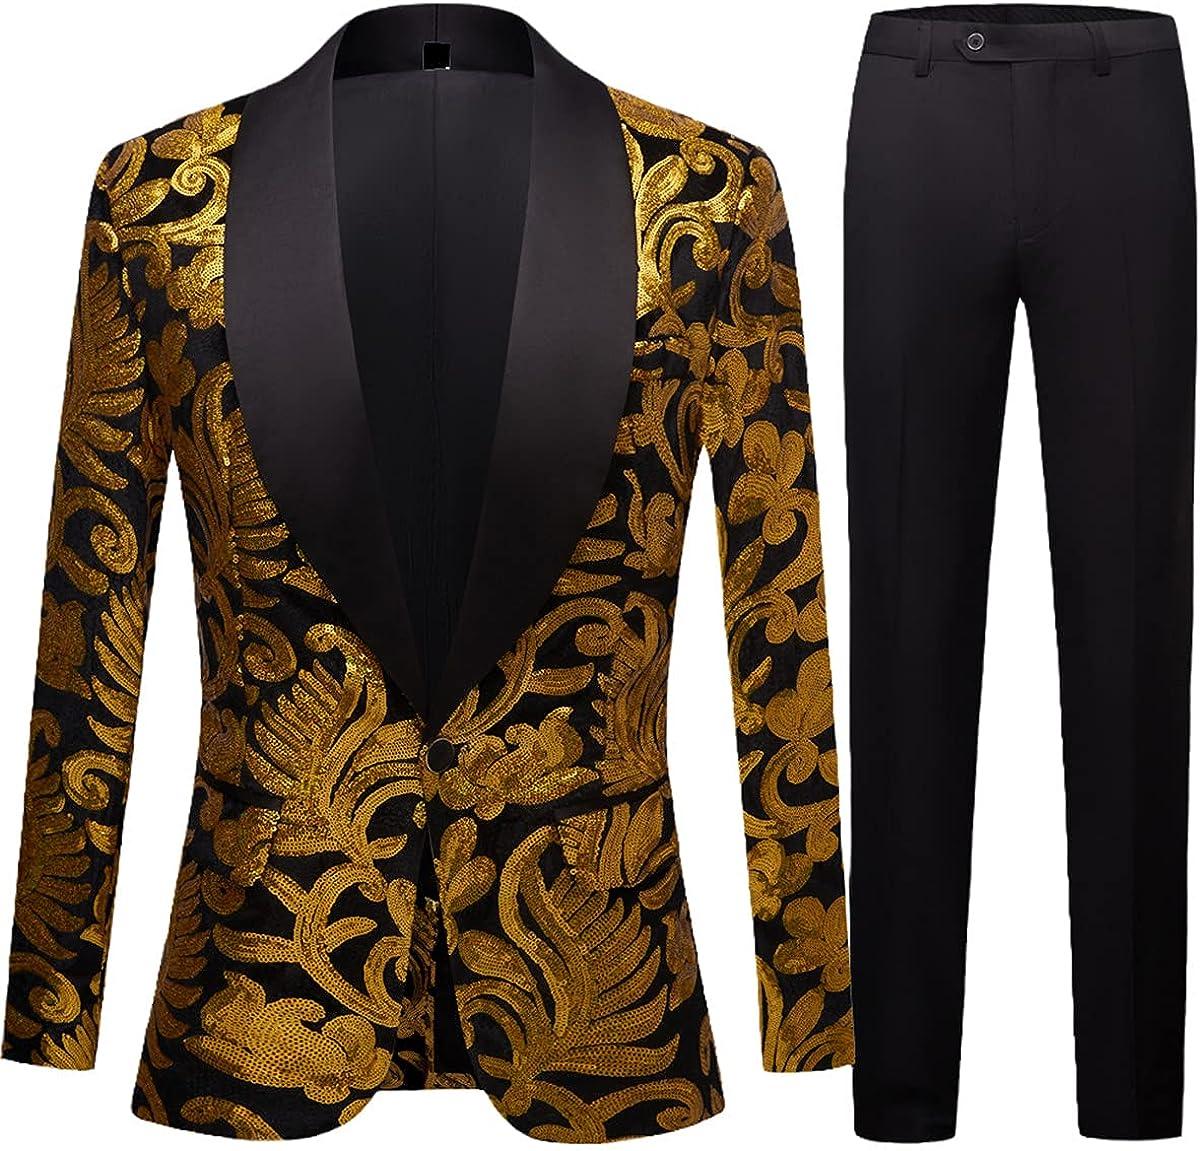 Men's Shiny Gold Sequin Blazer Nightclub Blazer Wedding Party Blazer Stage Singer 2-Piece Set